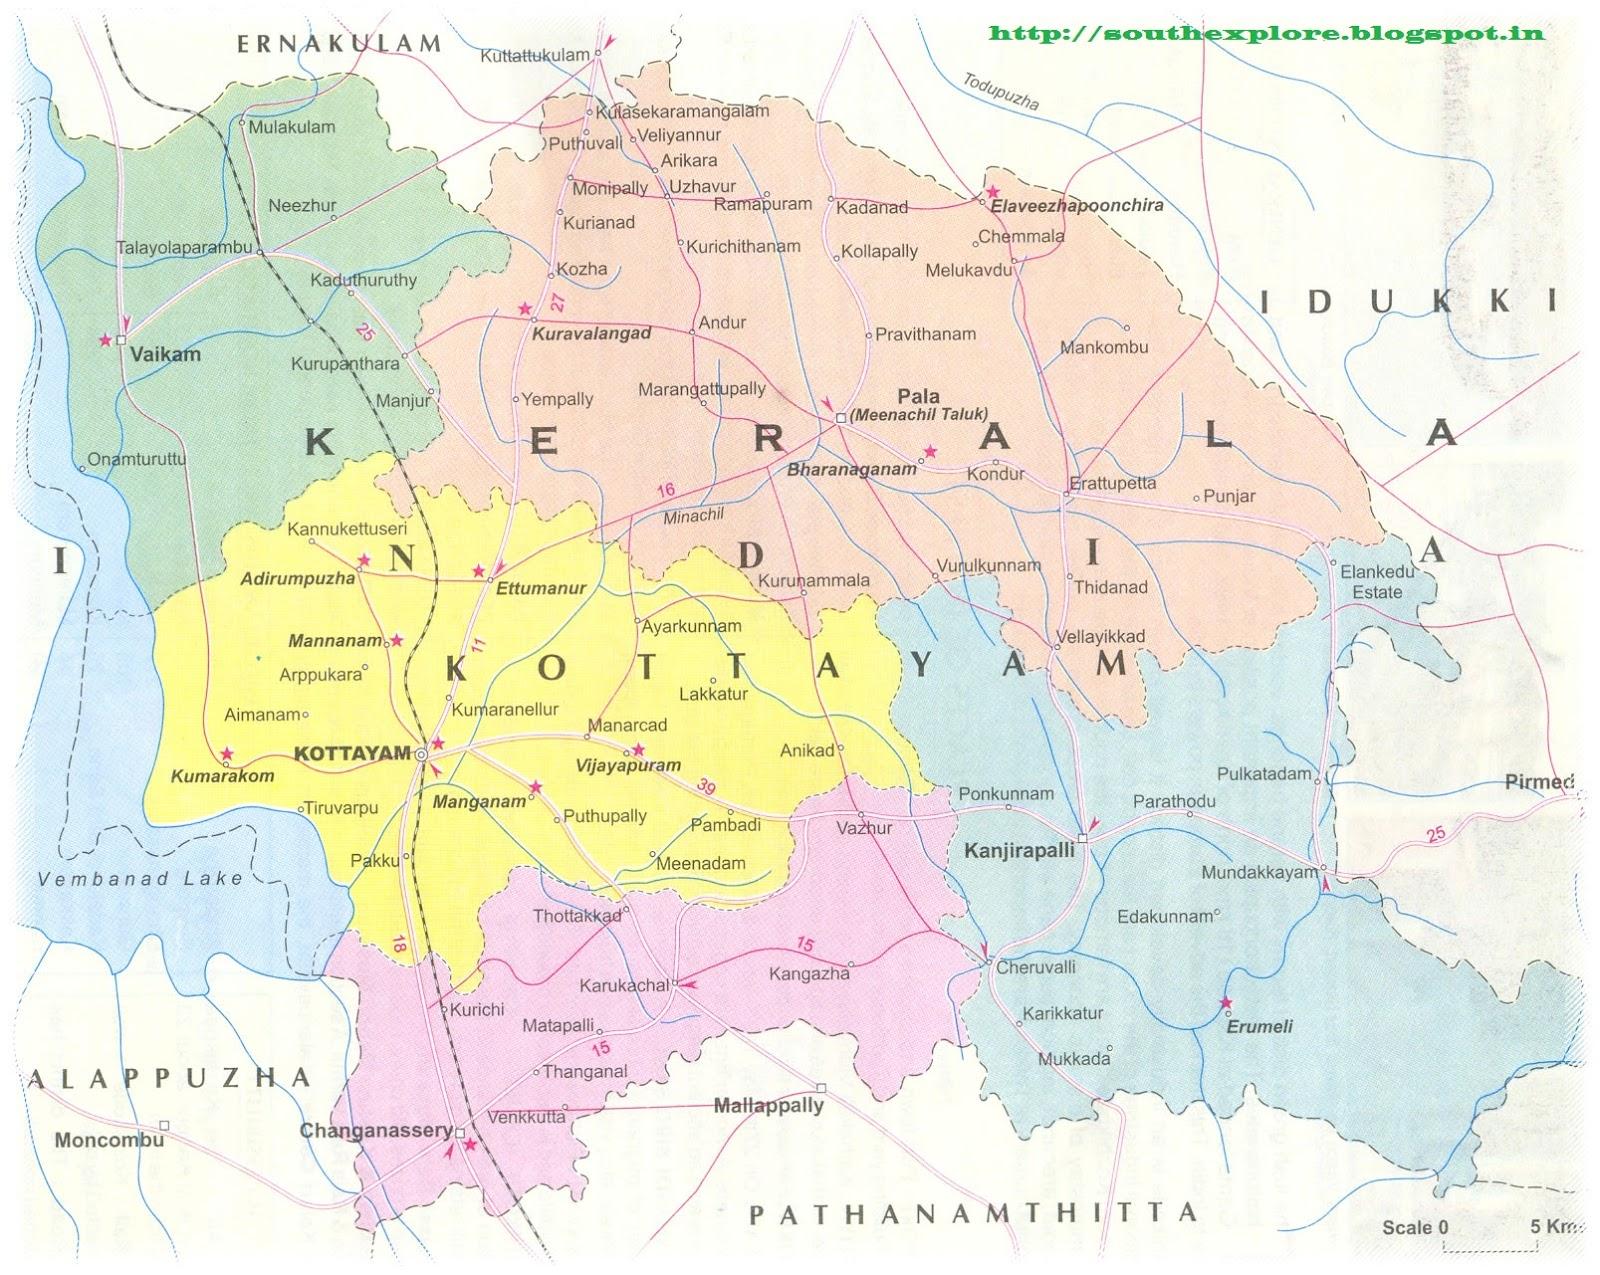 Kottayam India  city pictures gallery : KOTTAYAM TOURISM MAP | TOURIST PLACES IN KOTTAYAM KERALA | KOTTAYAM ...